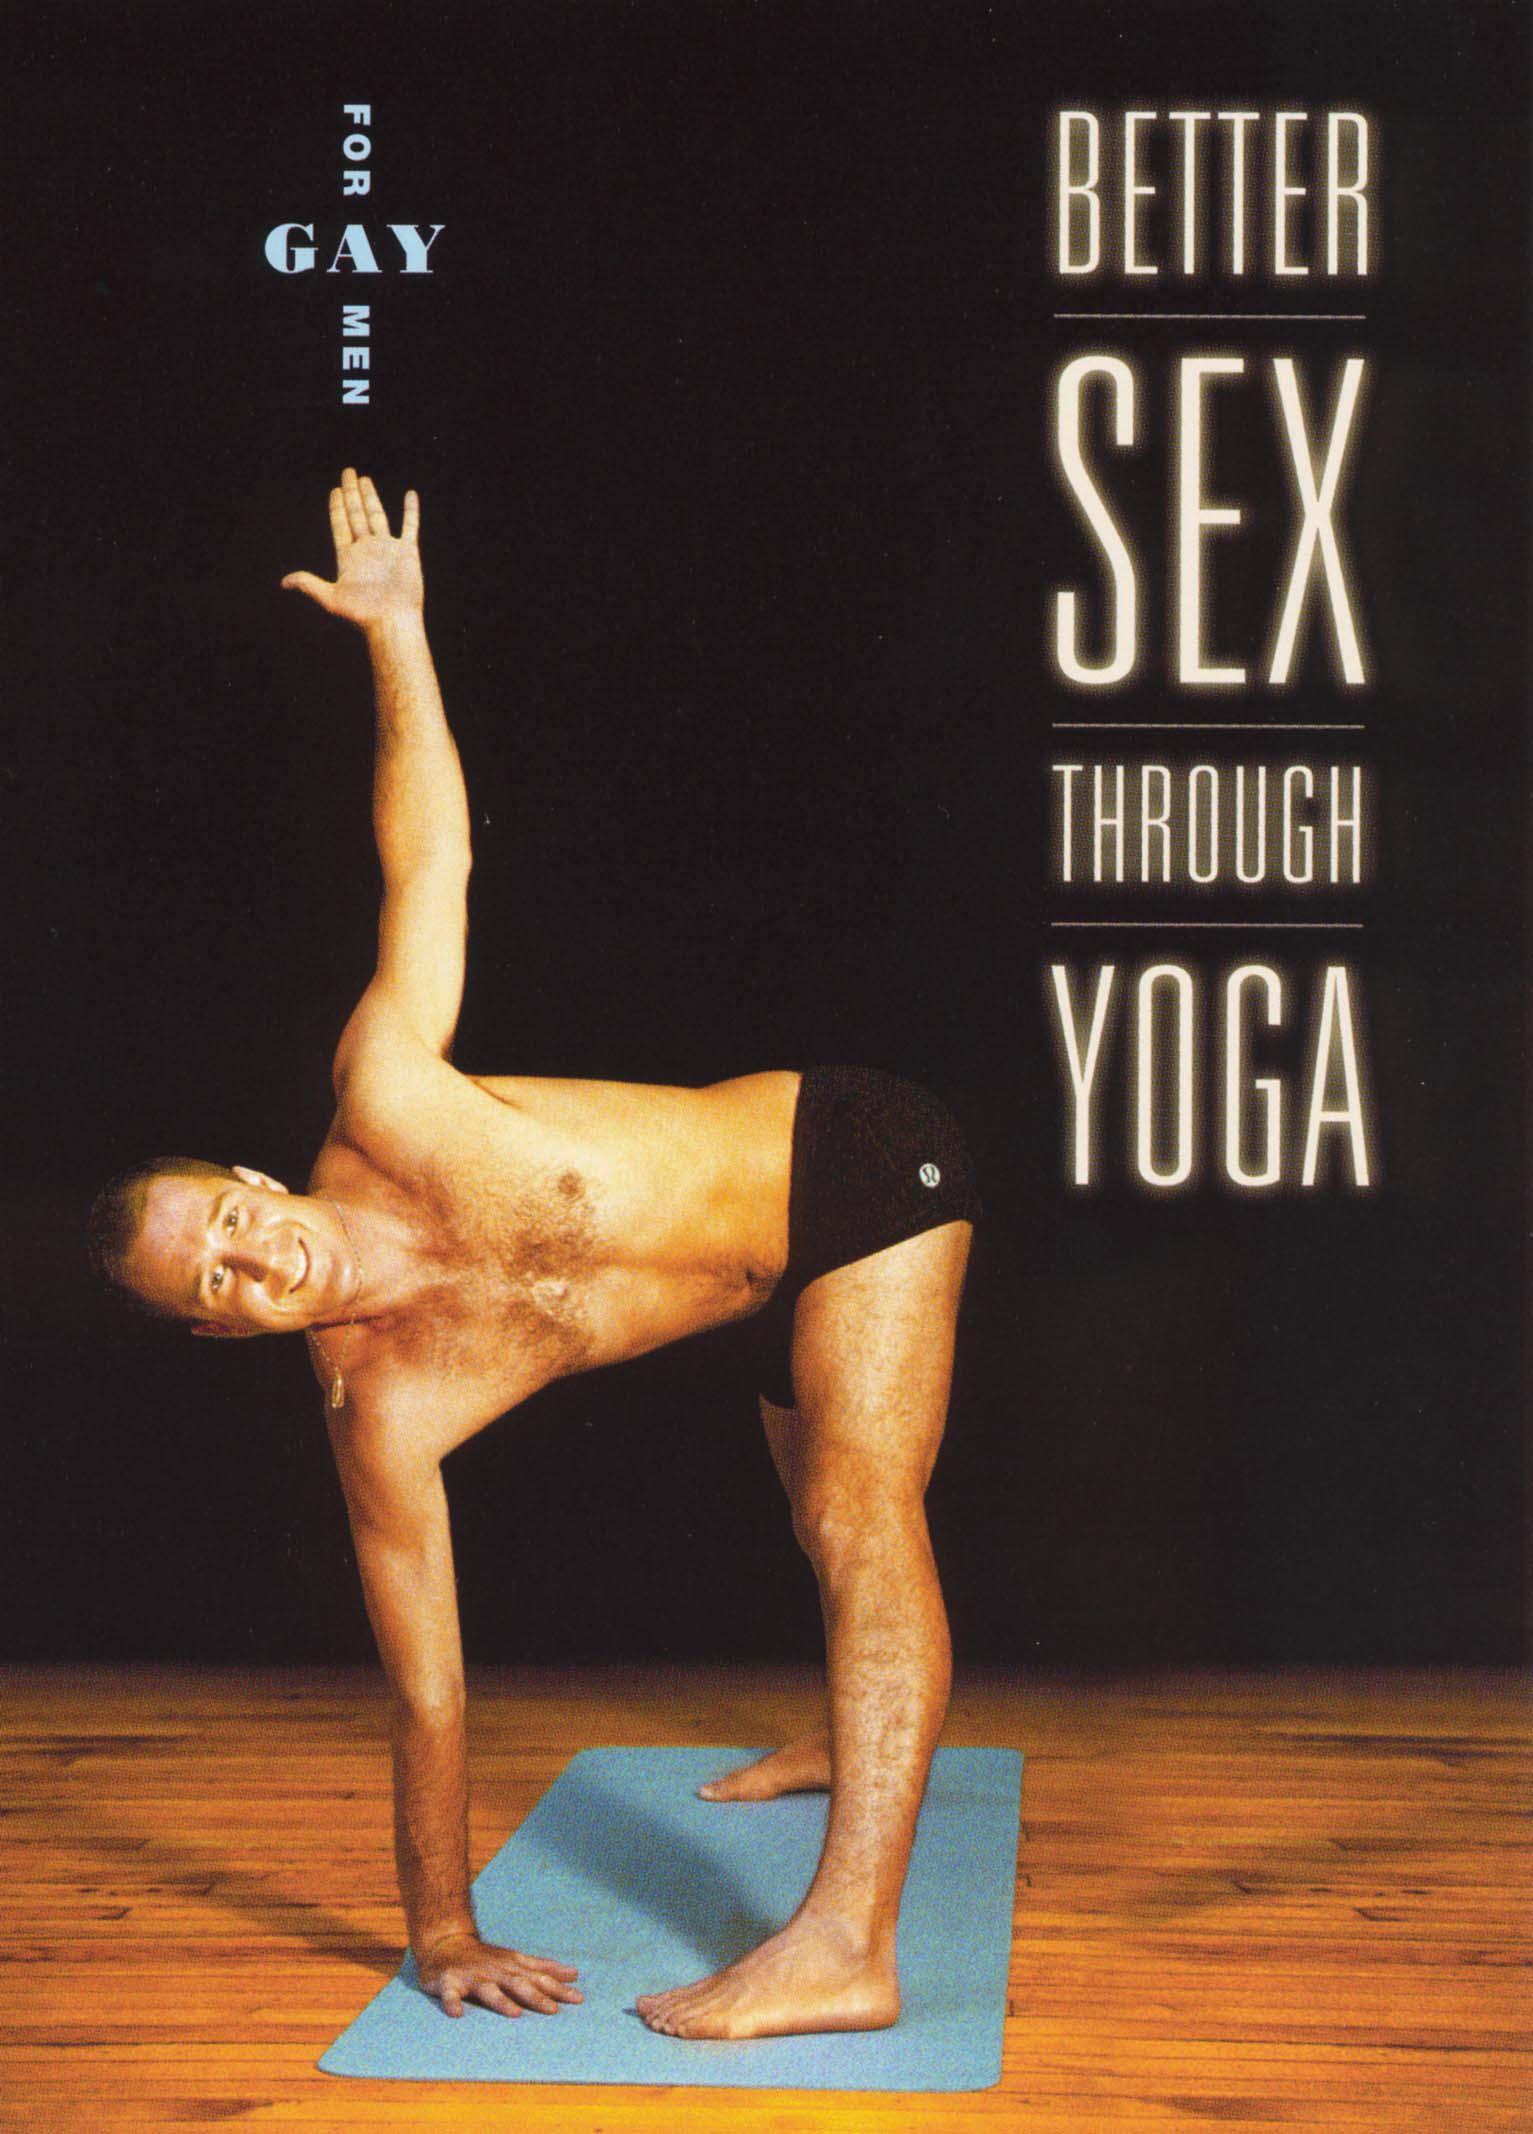 Better Sex Through Yoga: For Gay Men